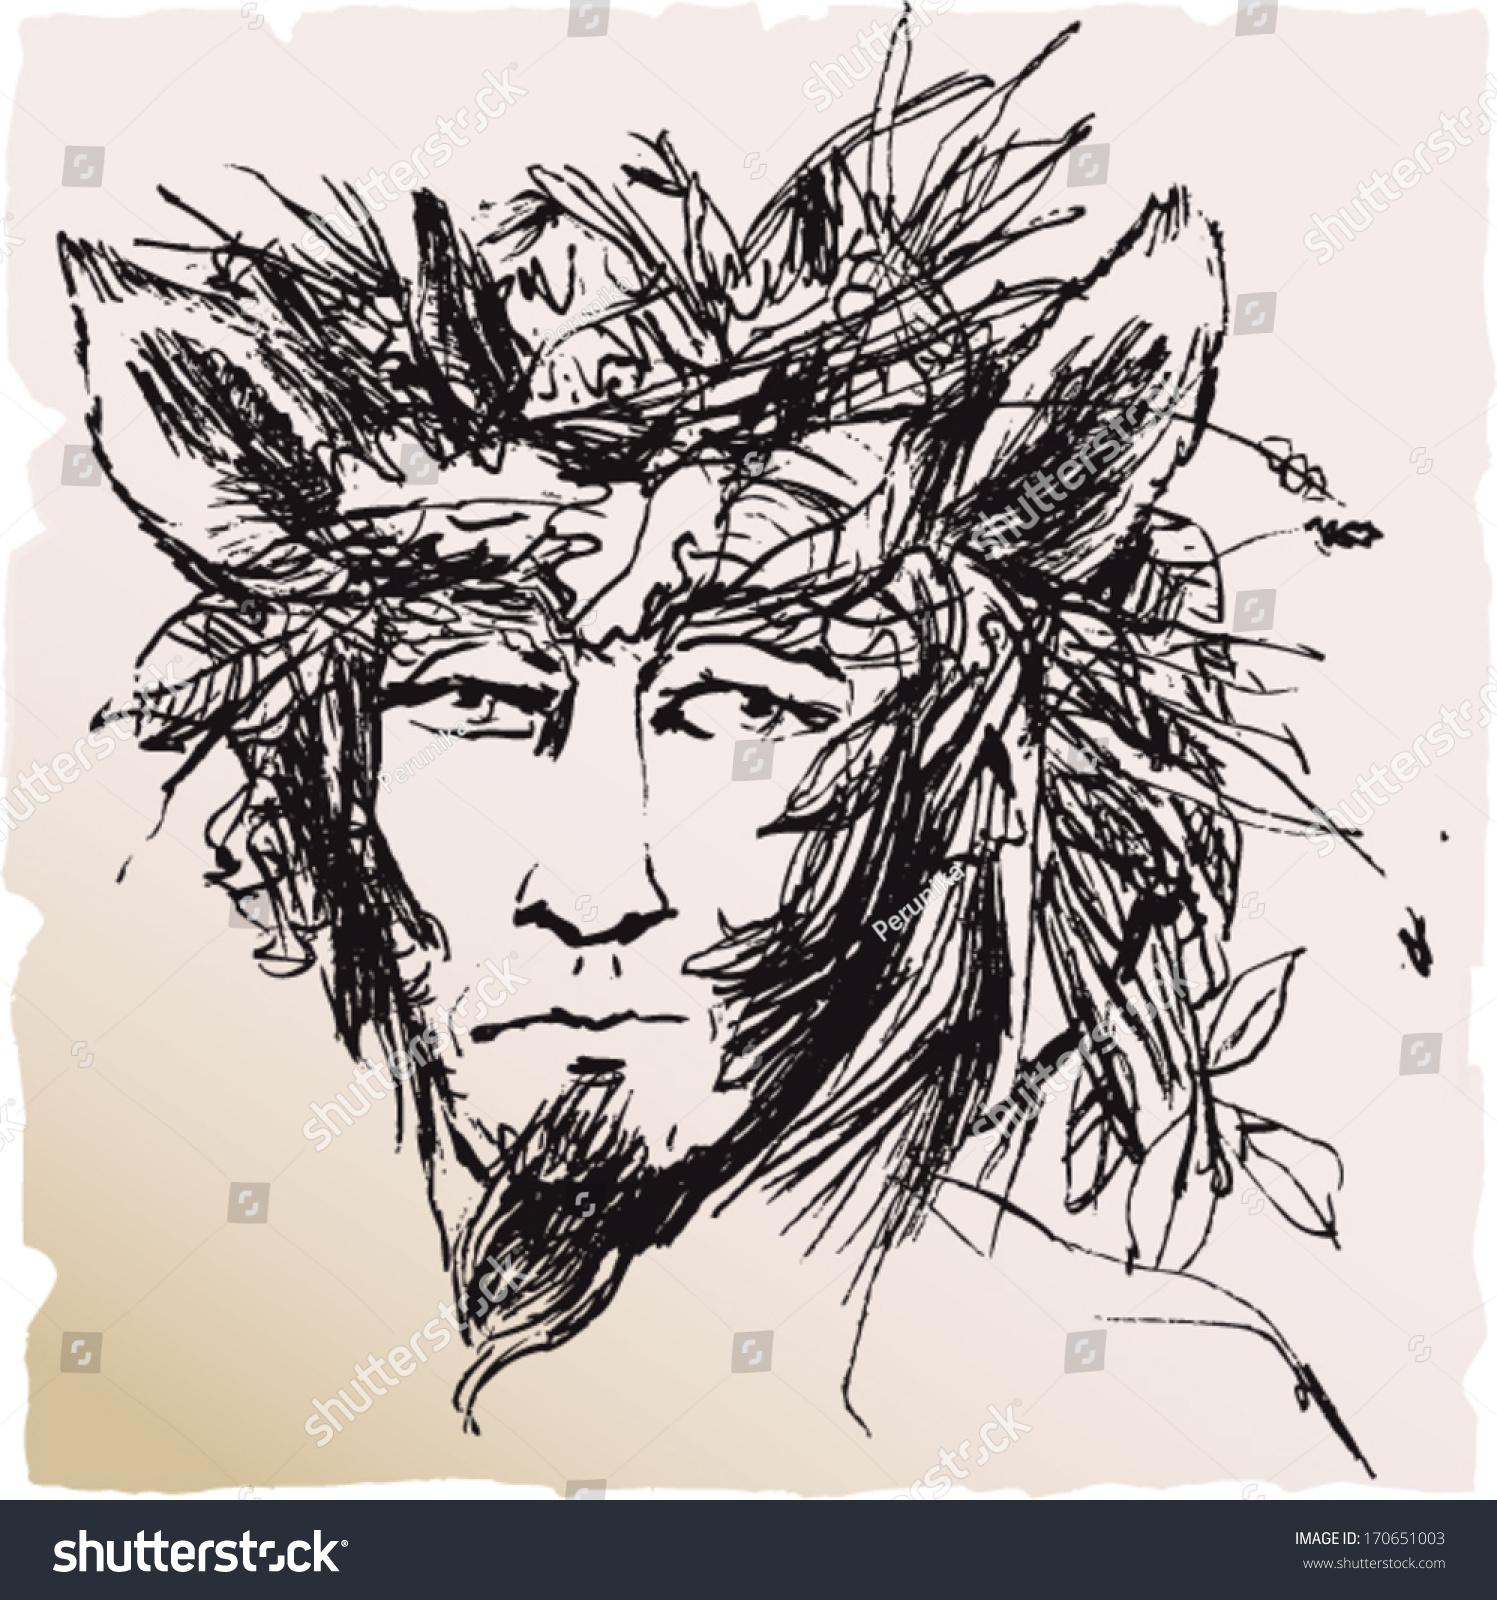 Greek mythology god pan faun sketch stock vector 170651003 greek mythology god pan faun sketch style illustration on paper buycottarizona